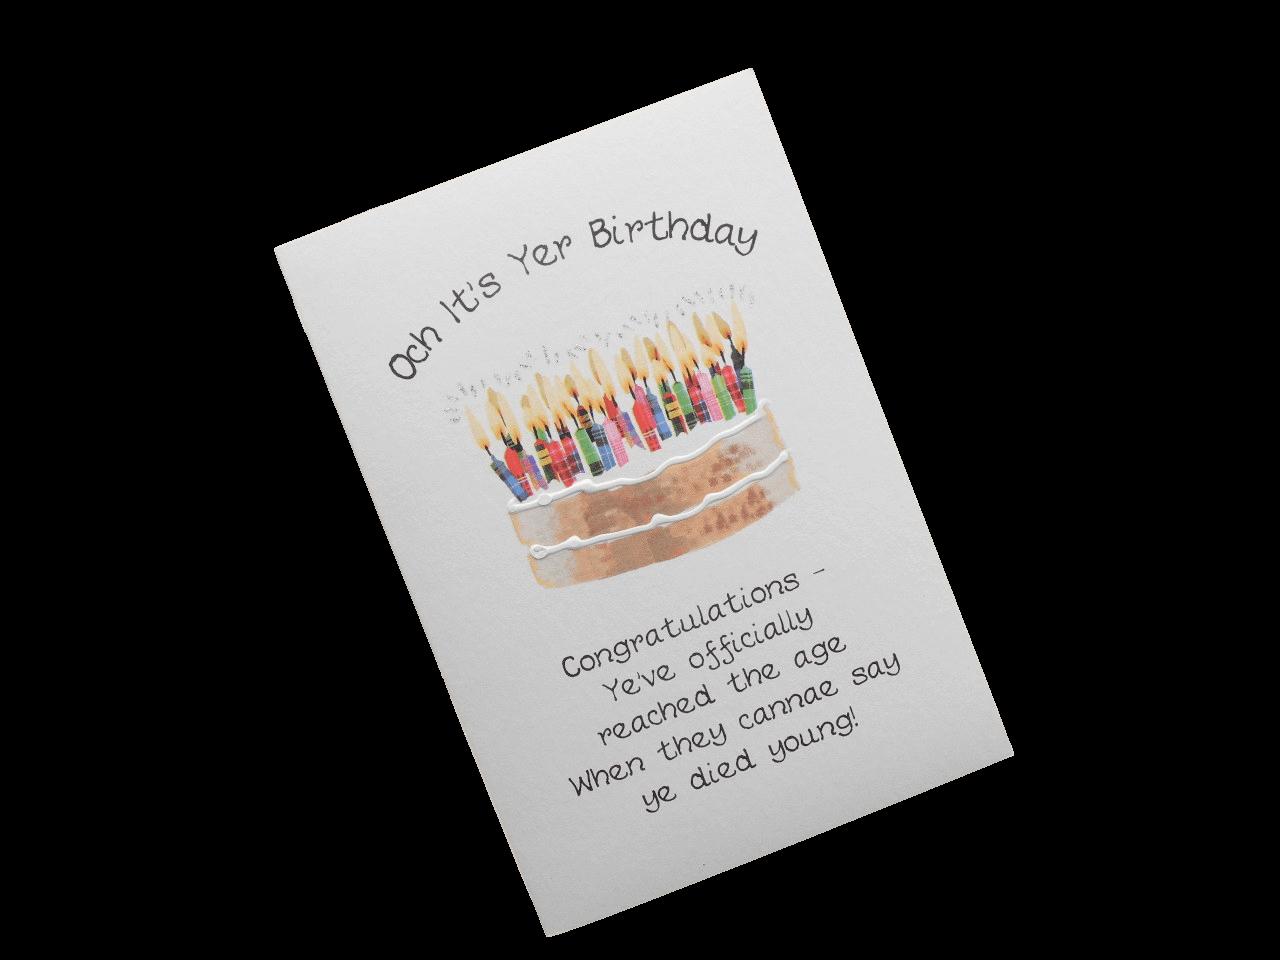 scottish birthday card cake candles tartan doric scots langauge